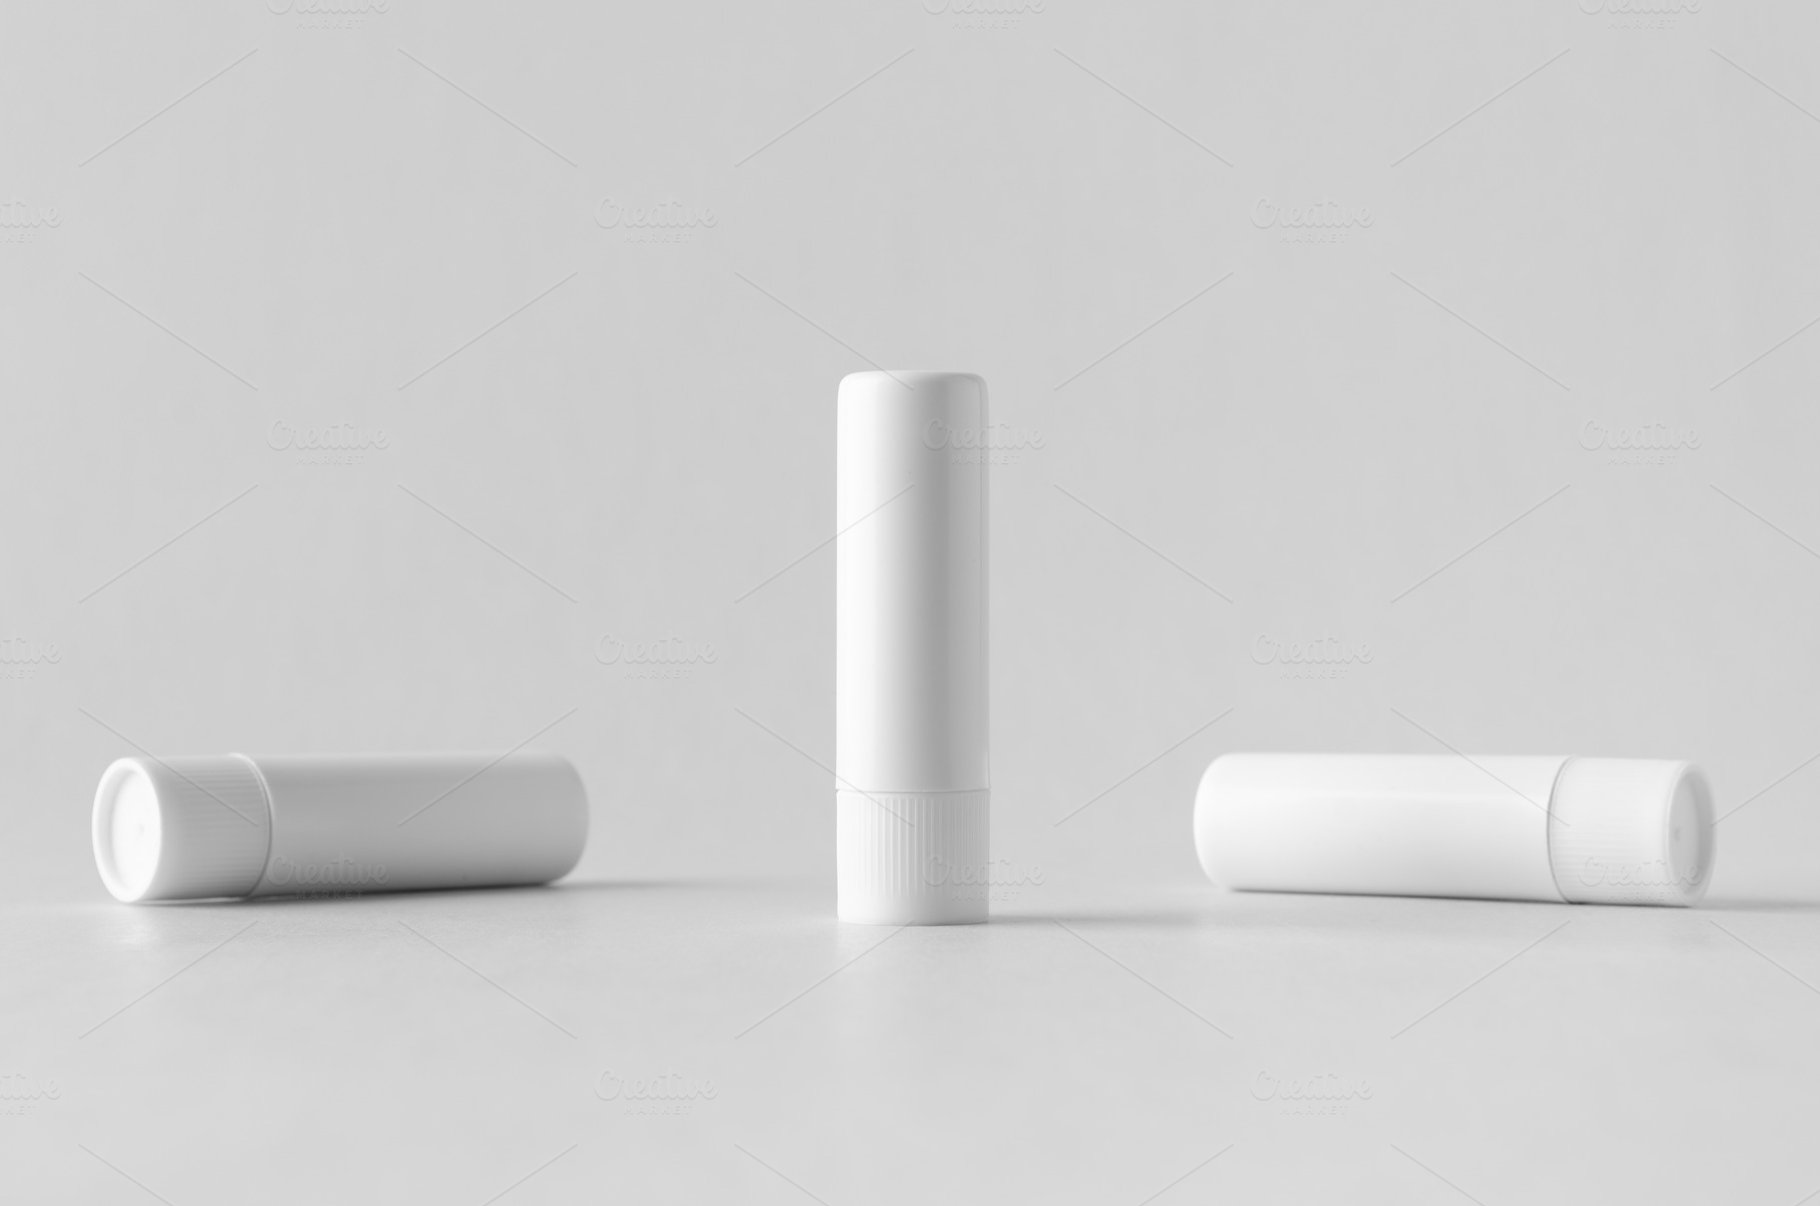 Lip balm packaging mock-up